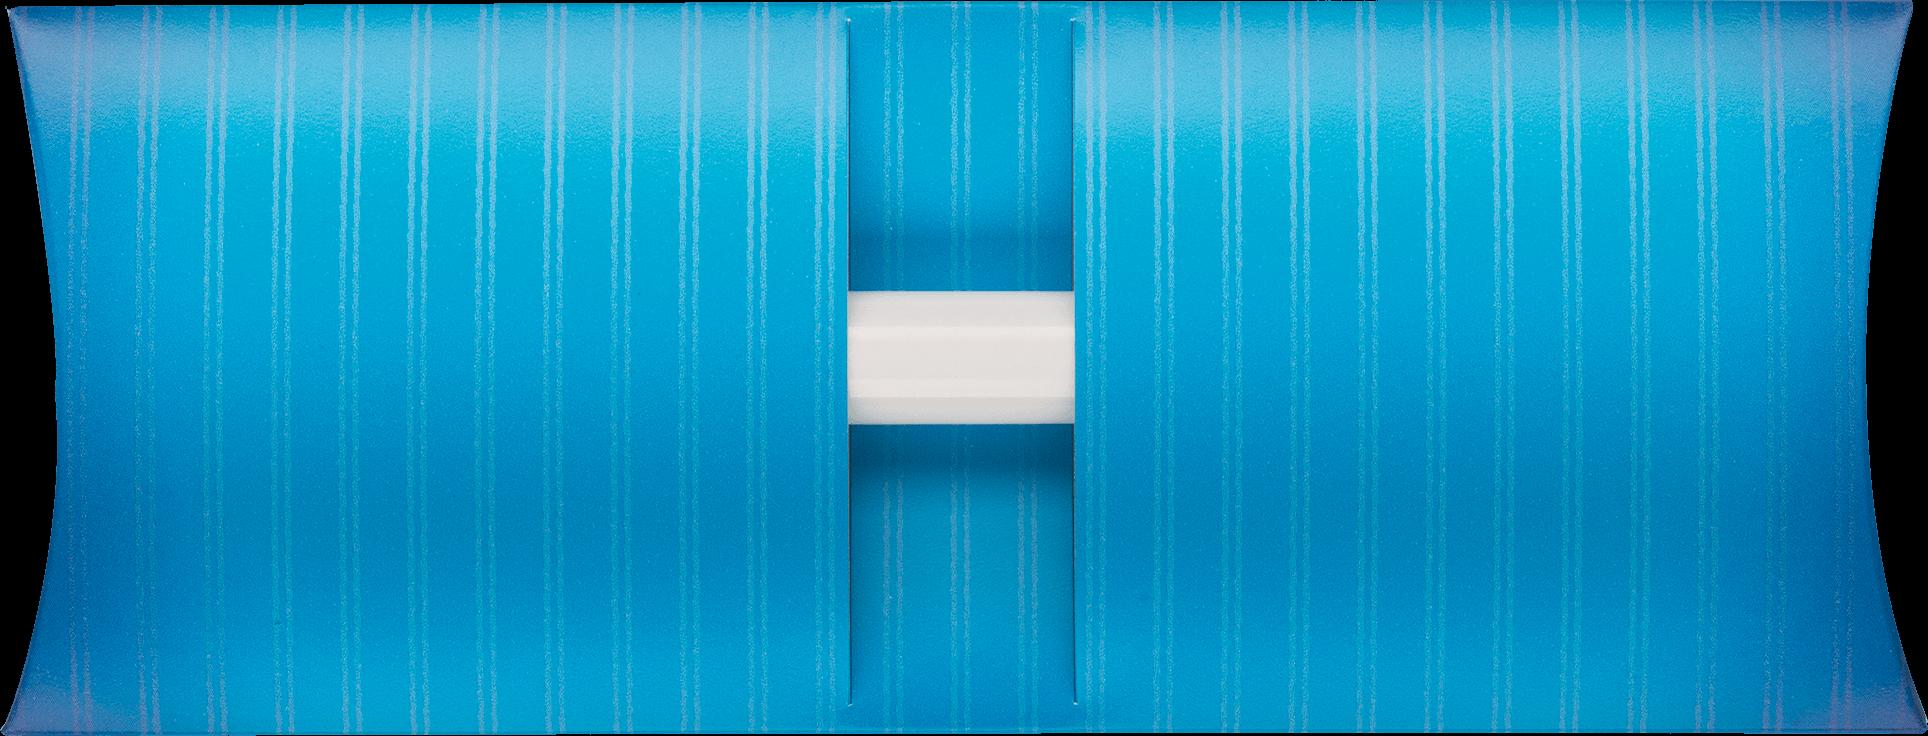 STABILO_GIFT_BOX_Stripes_Reverse_OriginalSize_sRGB_300dpi